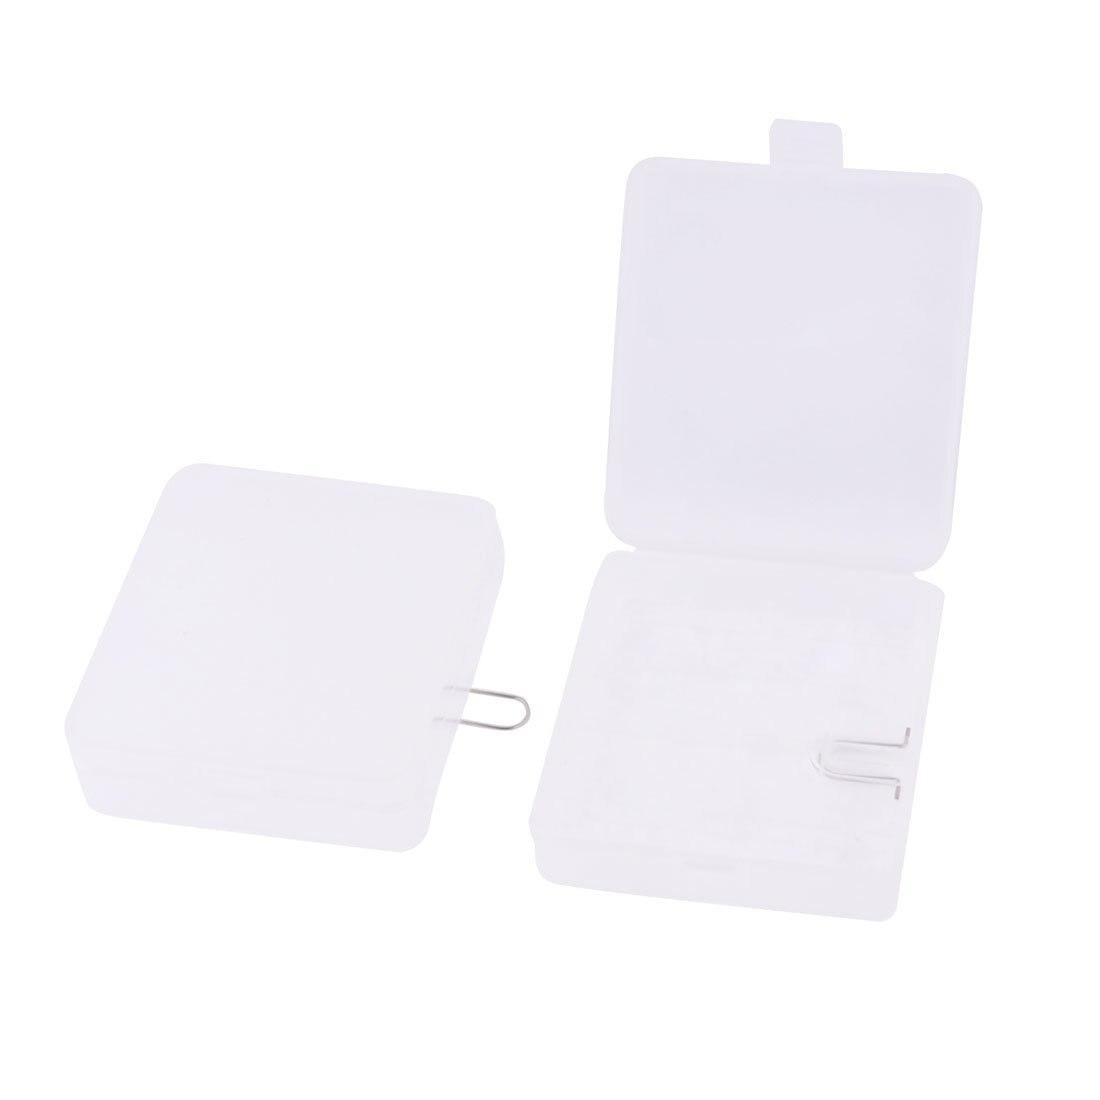 HGHO-2 Pcs Clear White Plastic Storage Box Case for 4 x <font><b>18650</b></font> <font><b>Batteries</b></font>